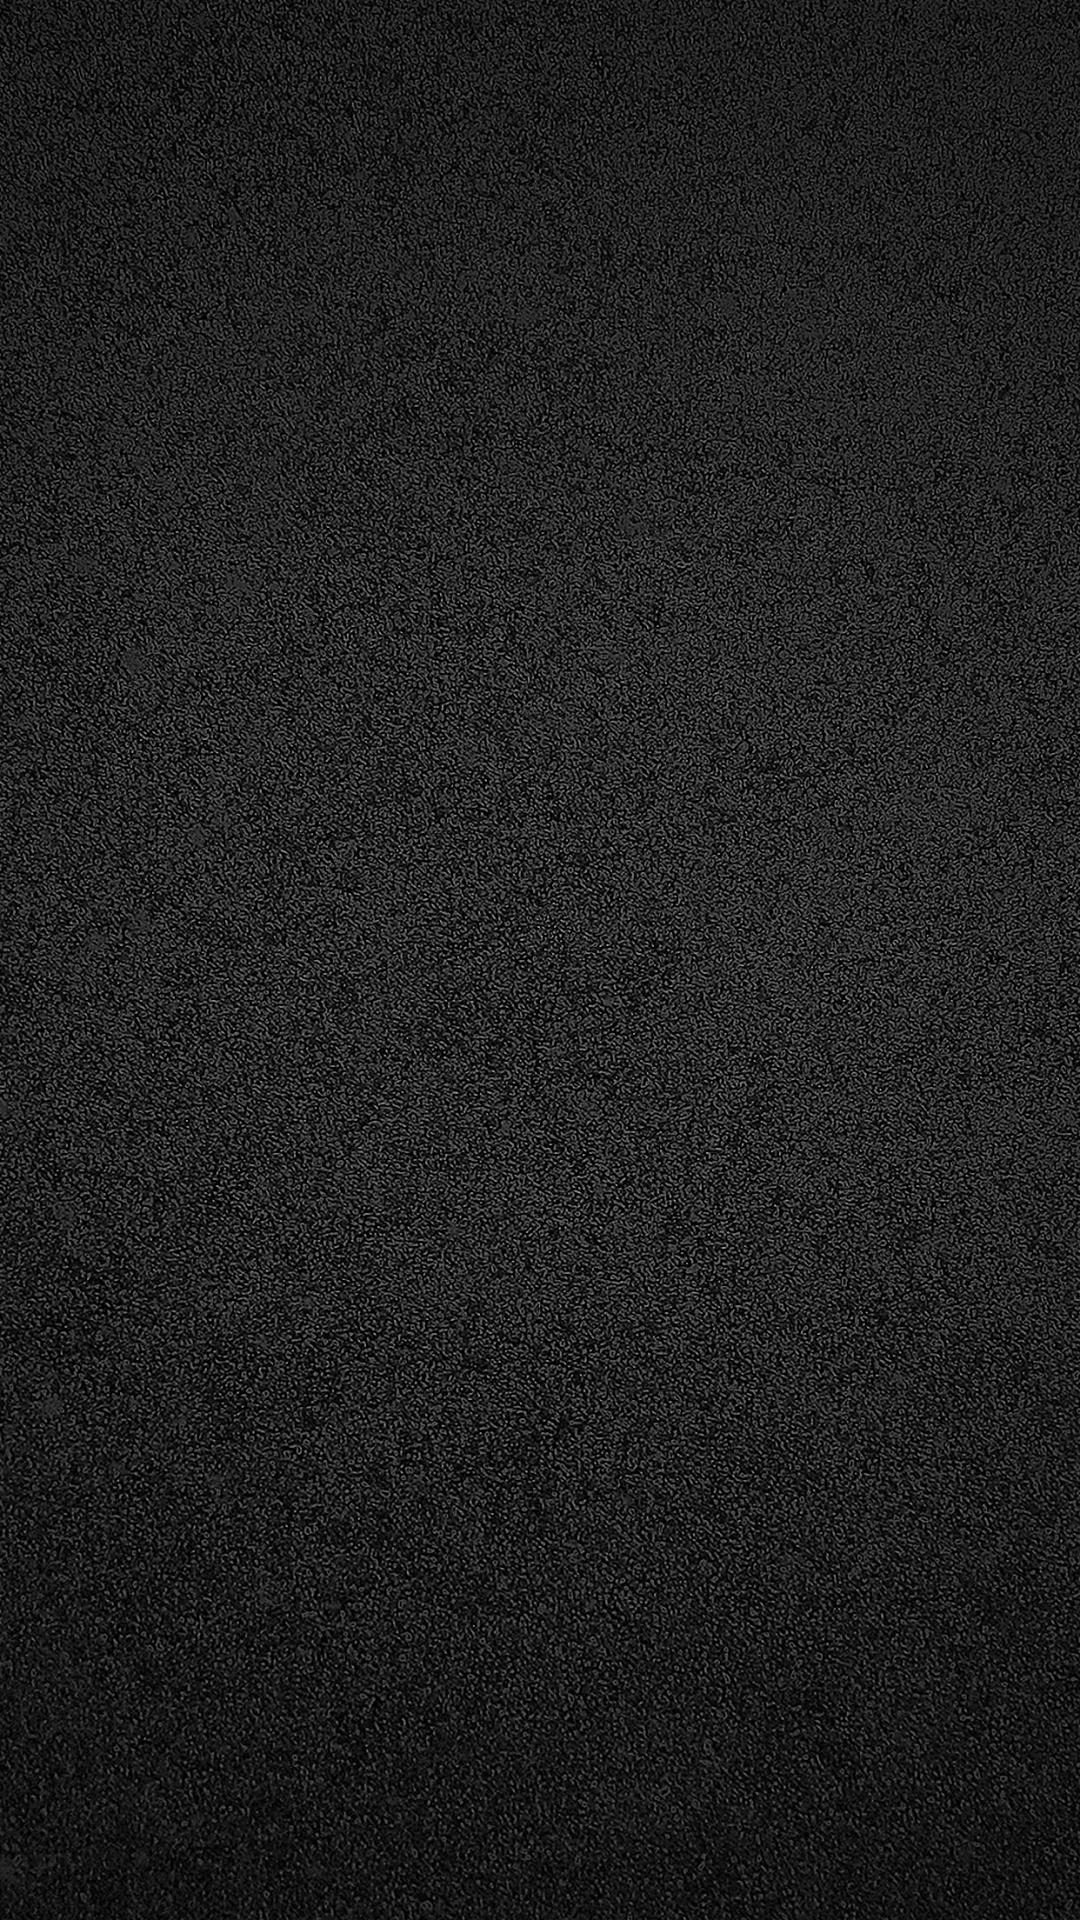 1080x1920 Simple Dark iphone 6s plus Wallpaper HD 1080x1920